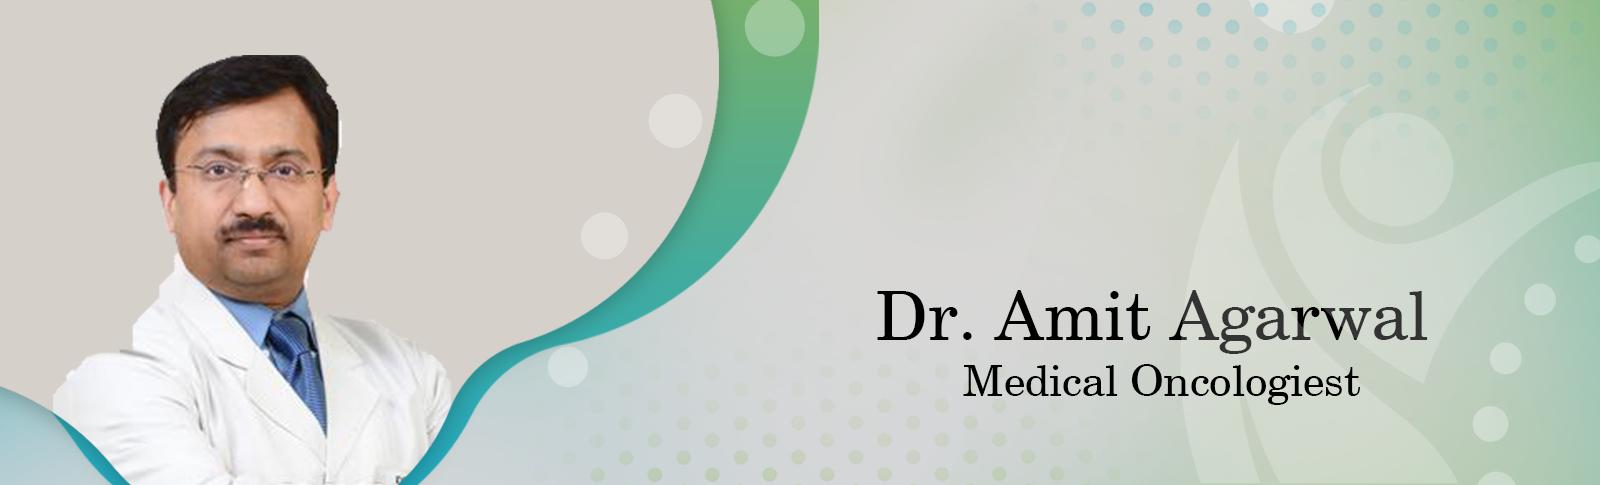 Dr. Amit Aggarwal